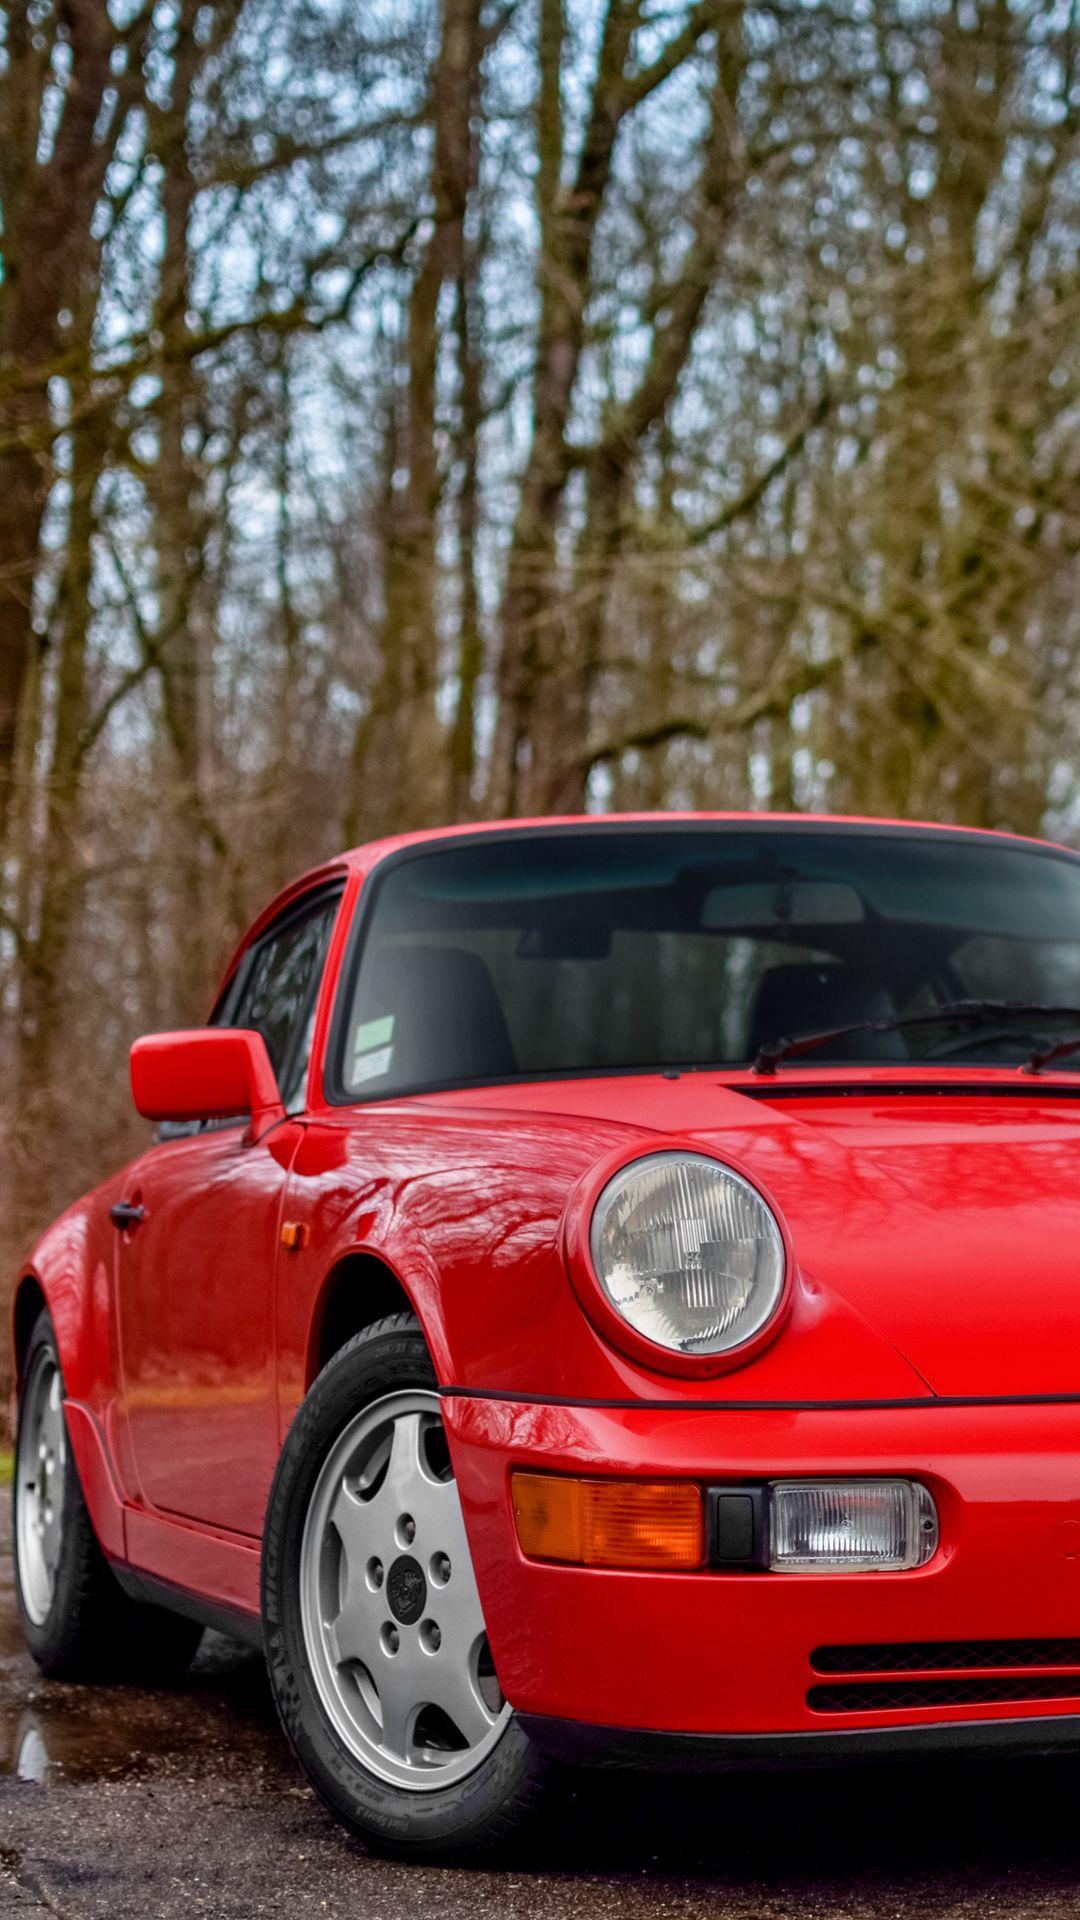 Porsche 964 Carrera 4 Background Wallpapers Free Download